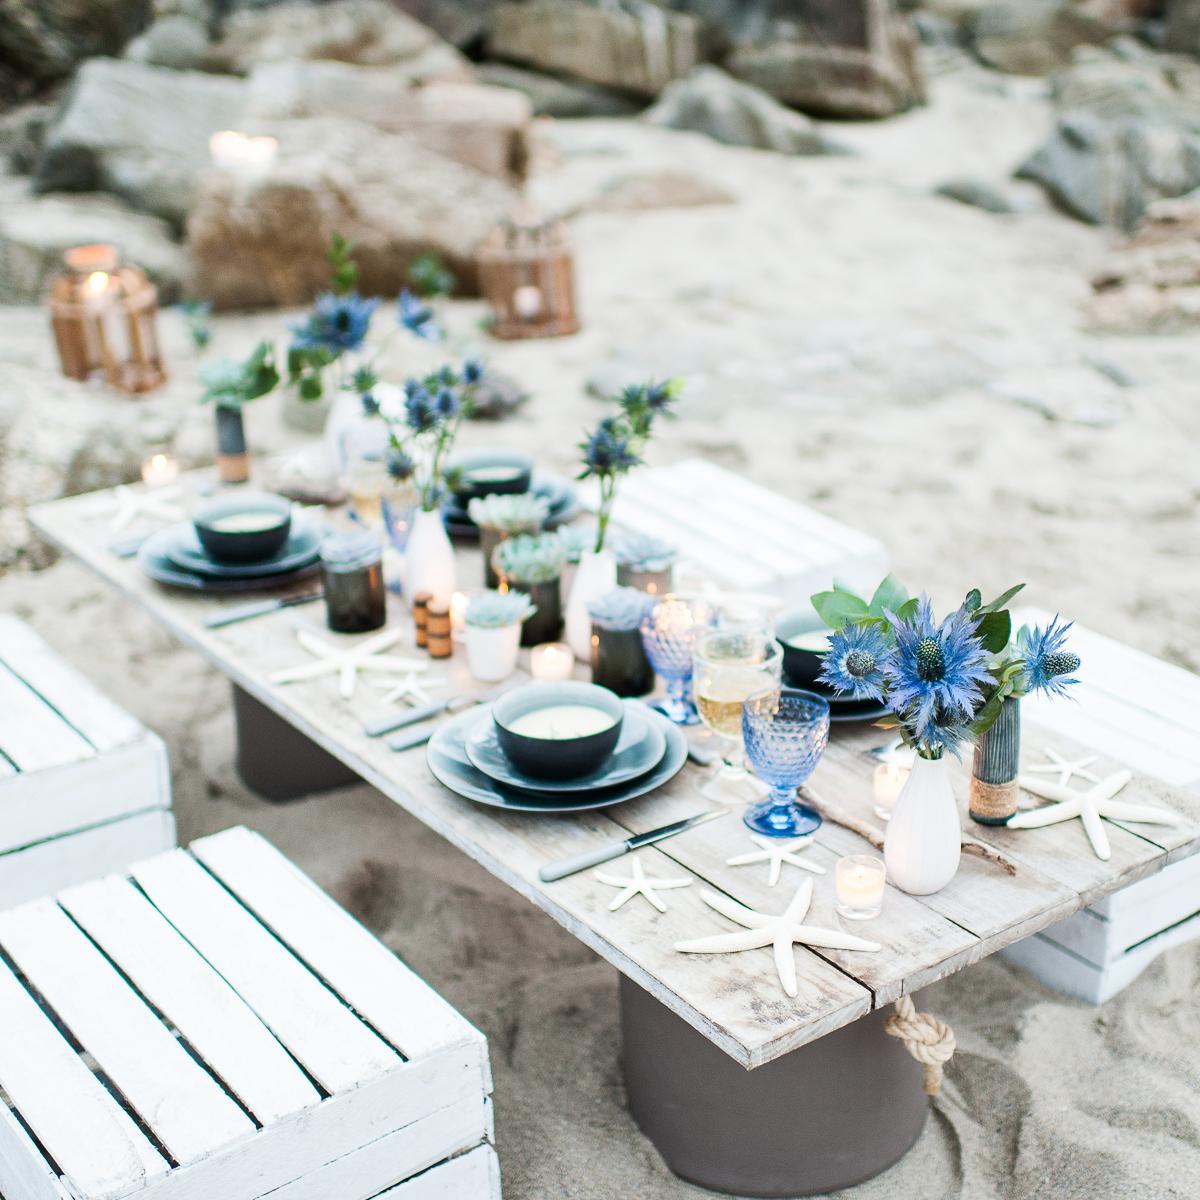 calista-one-lista-de-bodas-online-blog-de-bodas-inspiracion-decoracion-mesas-paula-franco-15